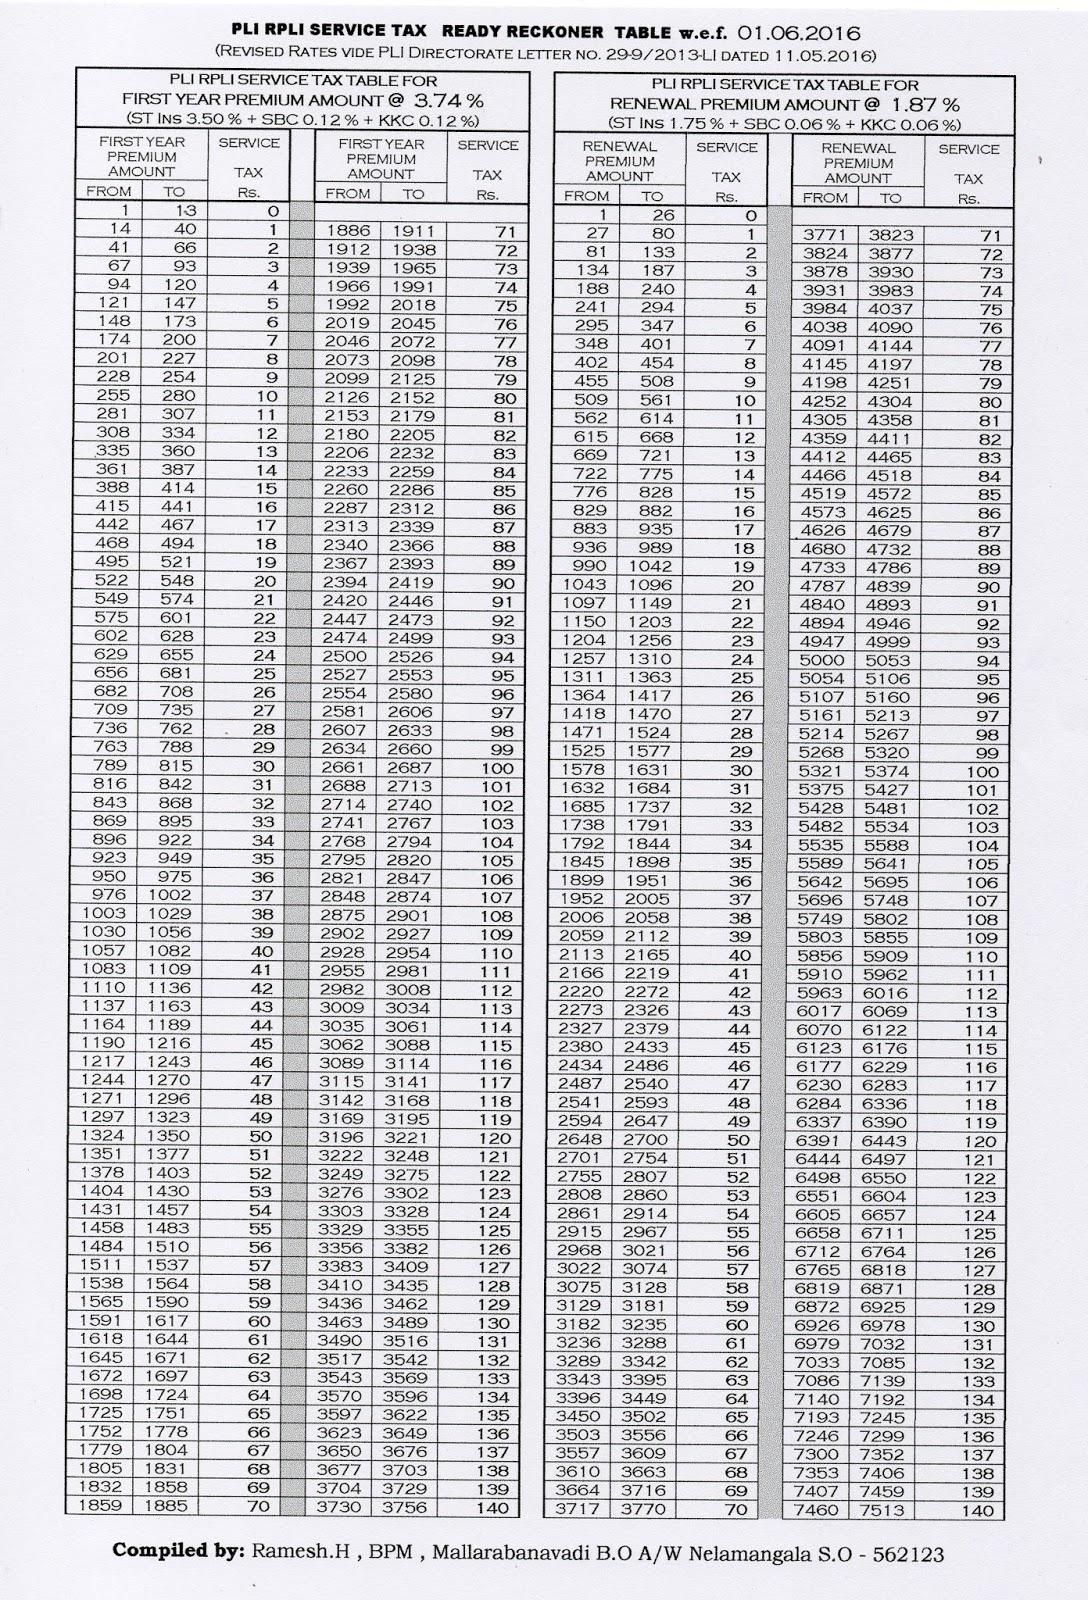 Aigdsu karnataka circle pli rpli service tax ready table for 08 tax table